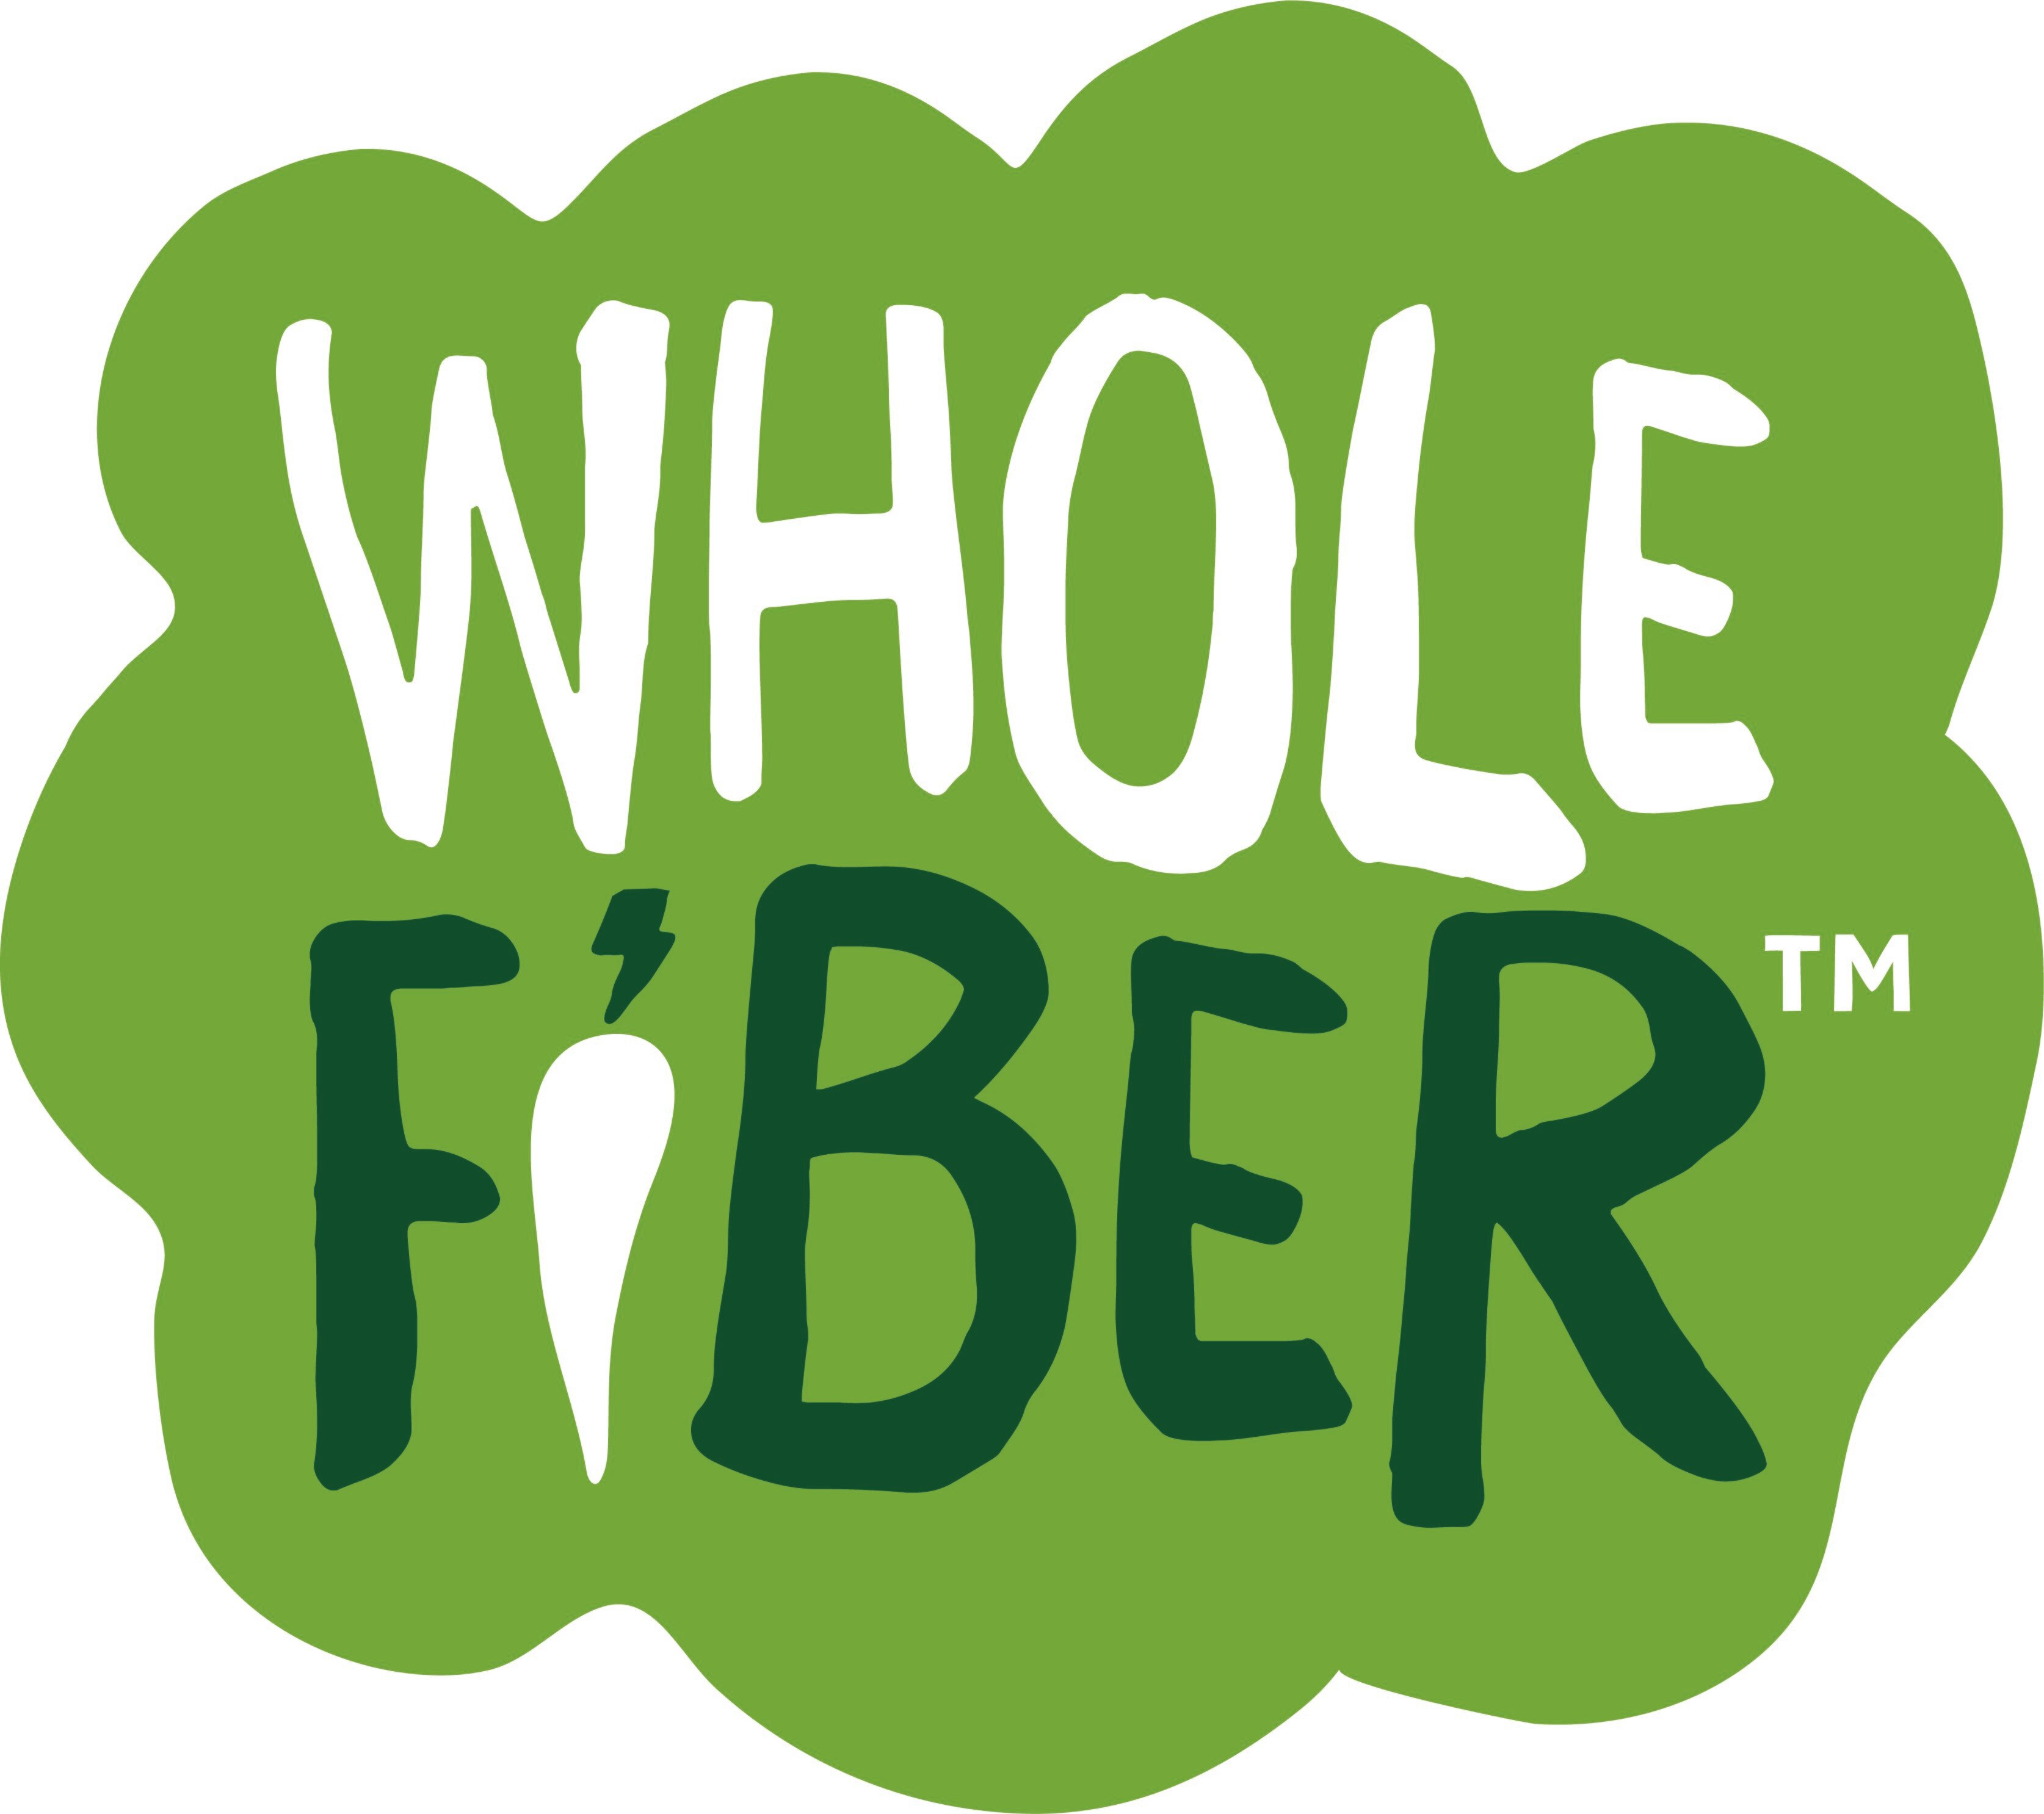 WholeFiber